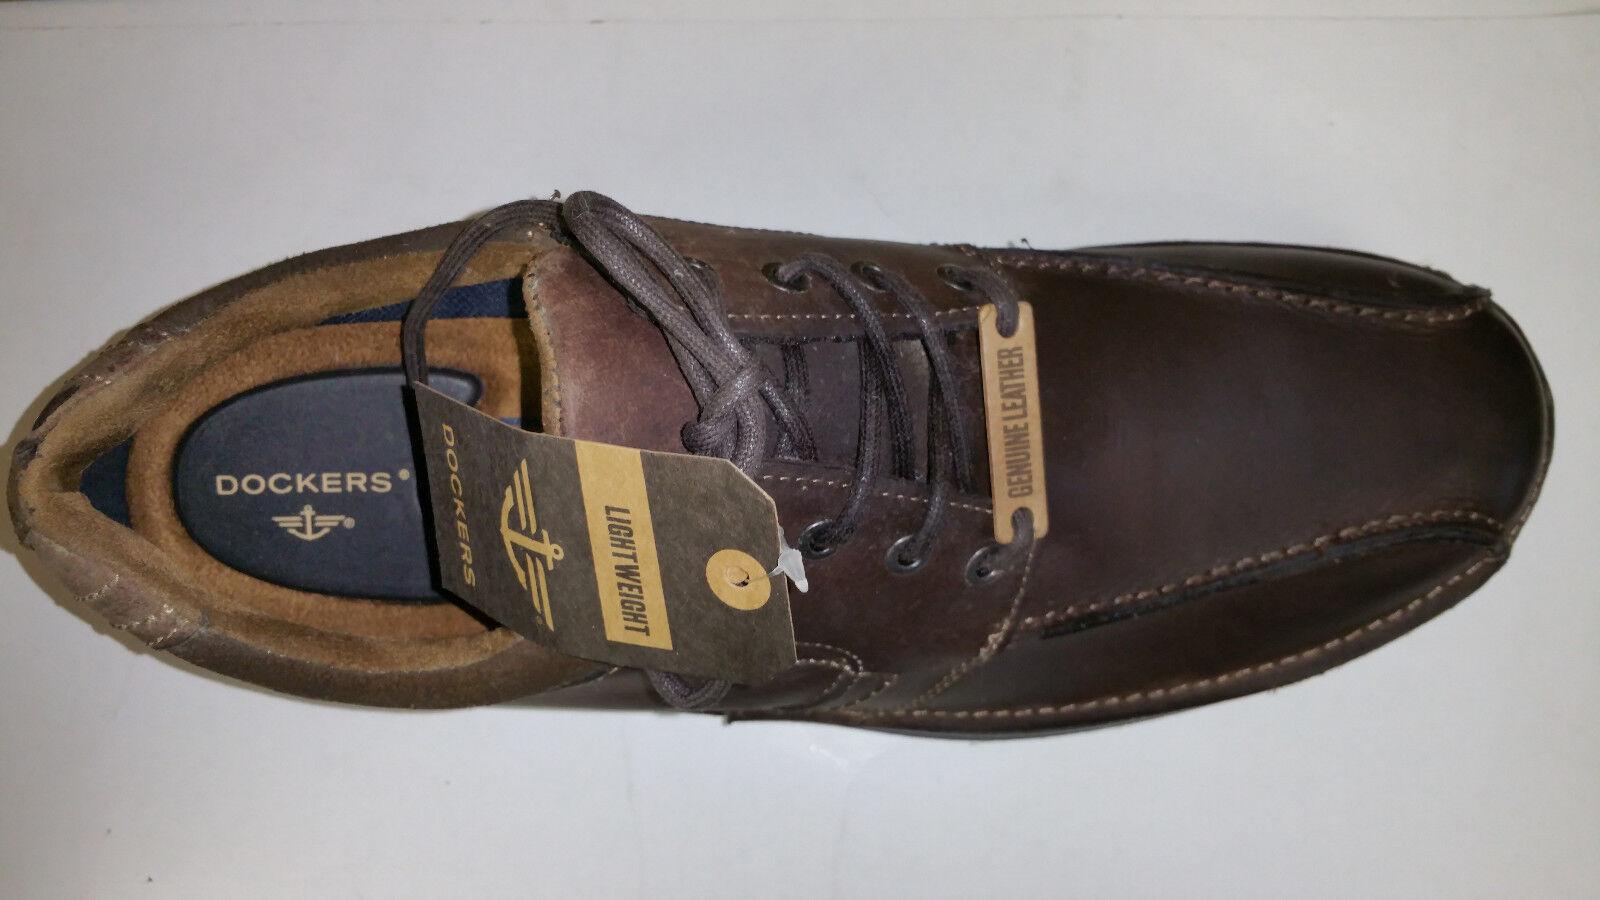 Dockers Lawtner Lawtner Lawtner Light Weight Chocolate Pelle Casual Shoes size 7-12 75d959